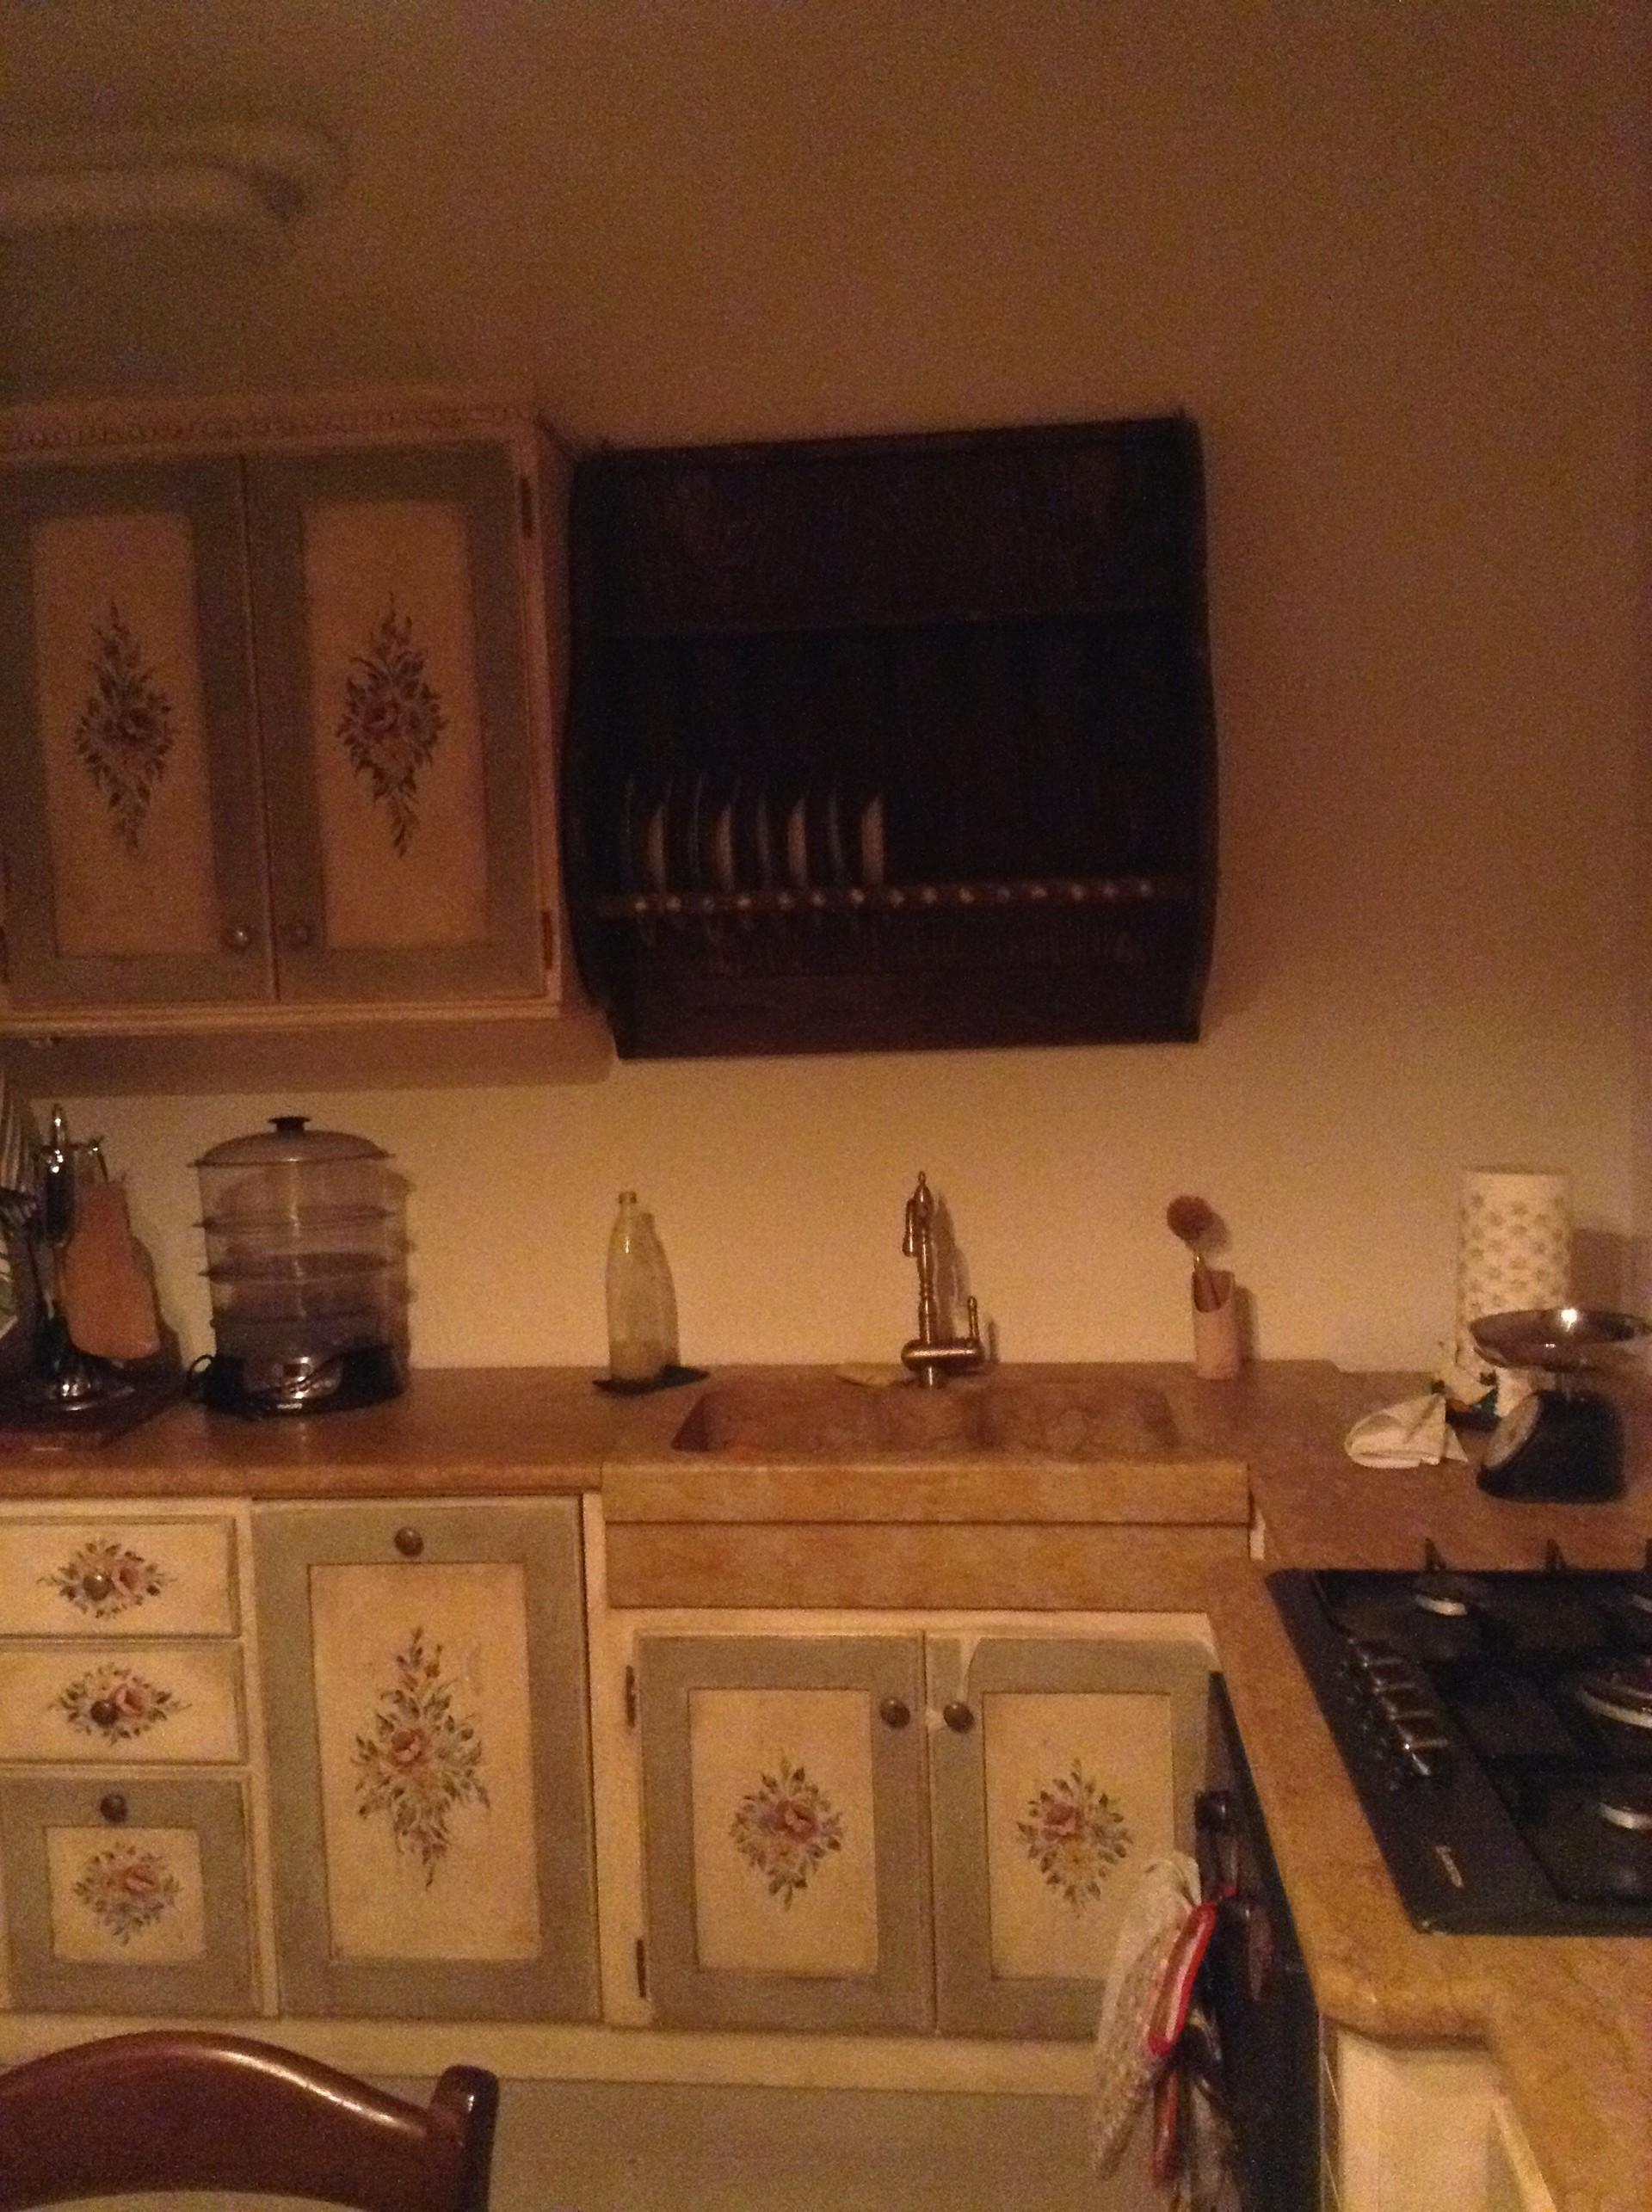 double-room-rent-new-share-flat-2bda30a795368067edd9a1eeef3d5765